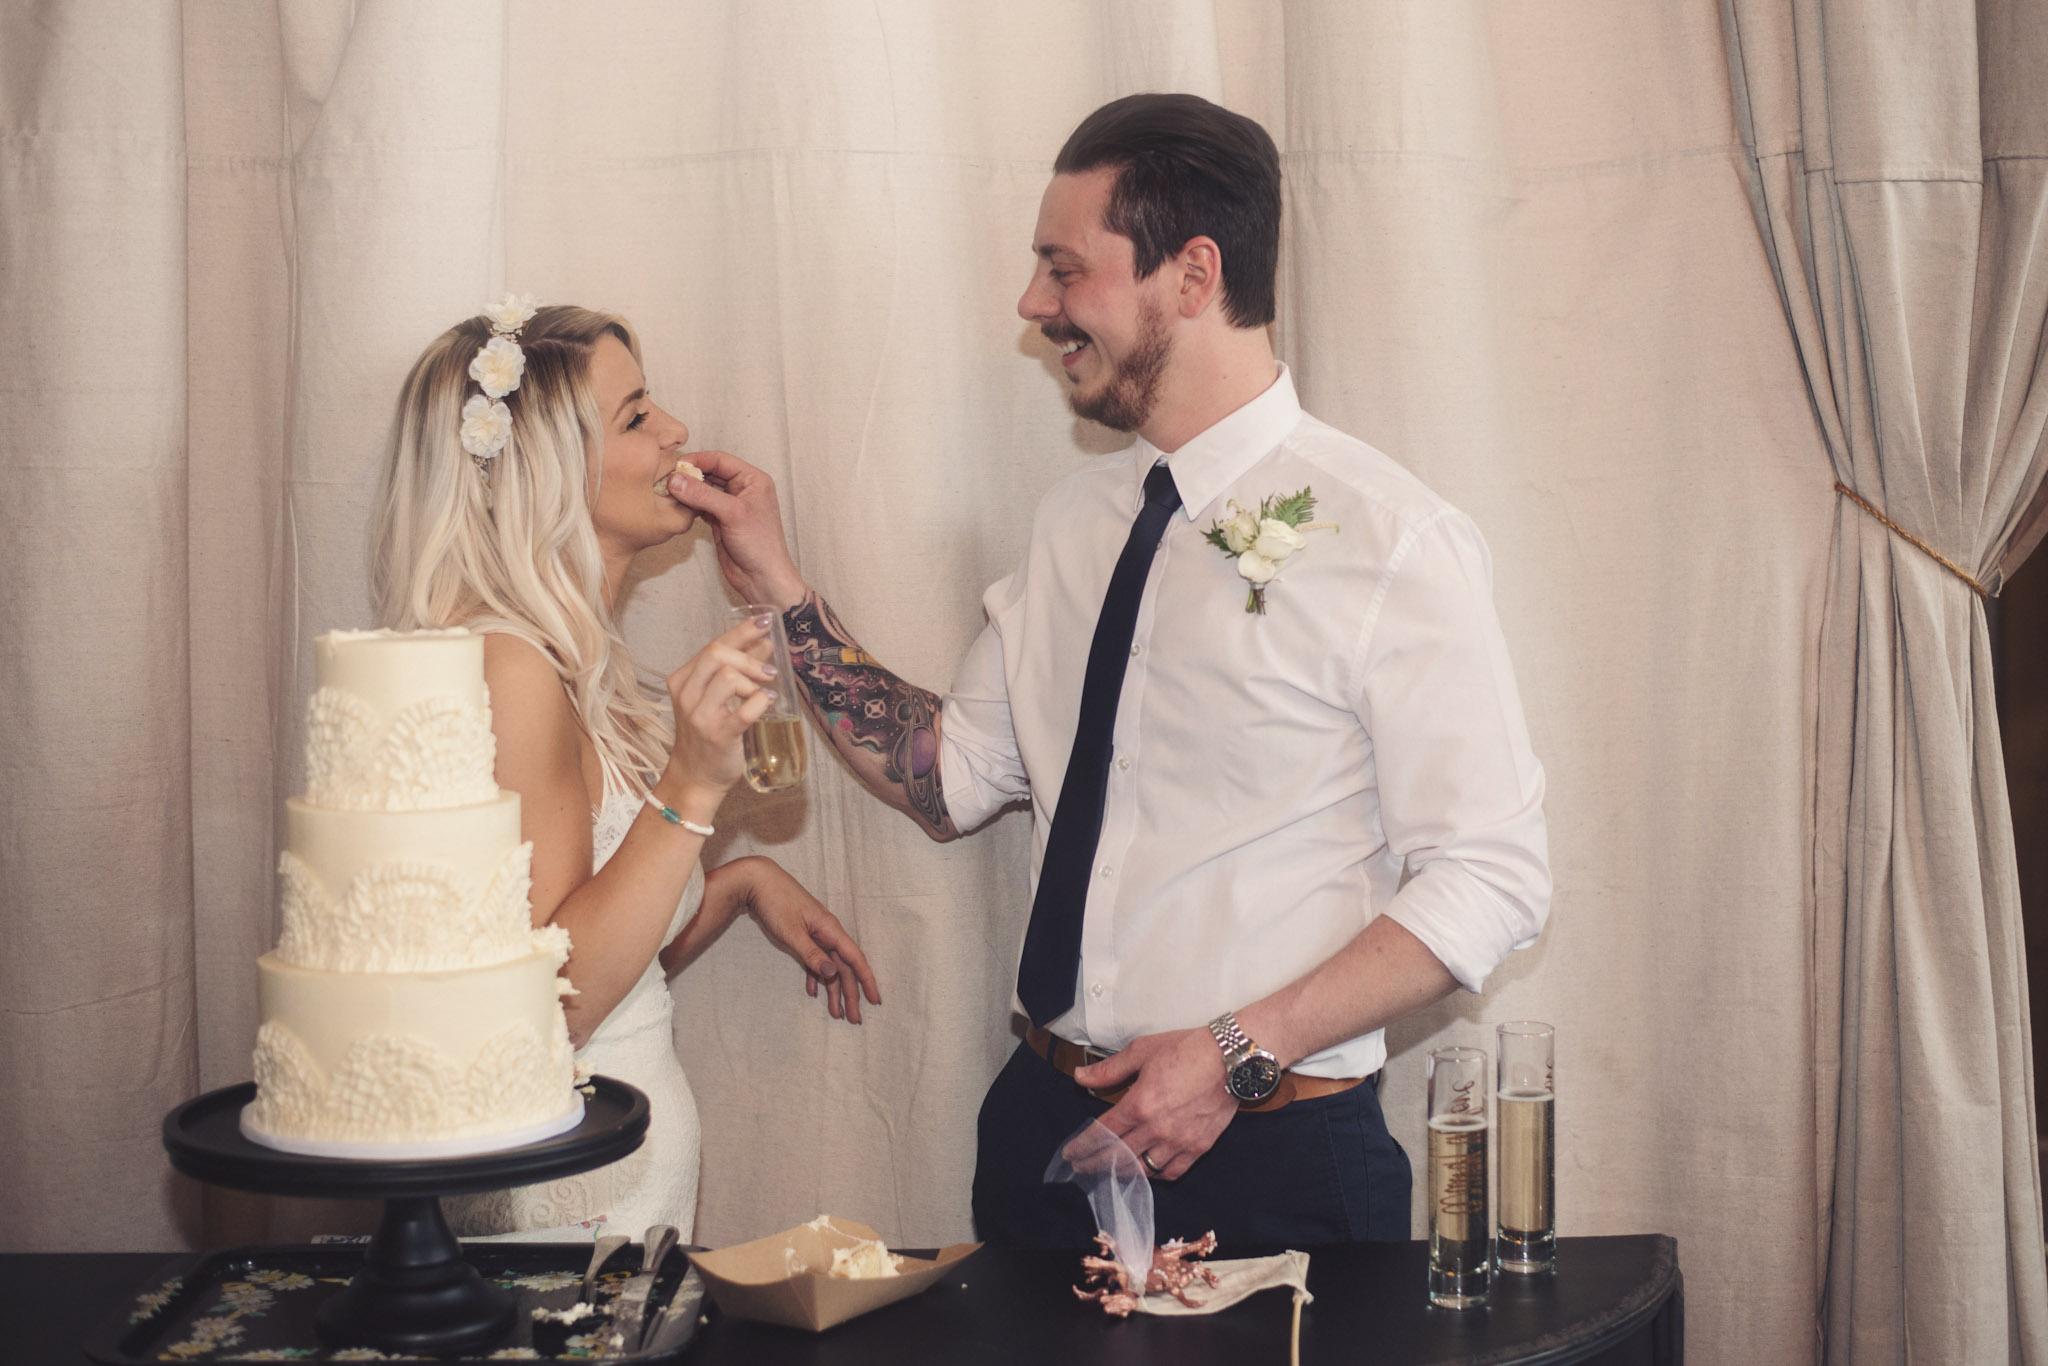 Kansas_City_Intimate_Small_Budget_Wedding_Venue_Dalton&Lauren_252.jpg